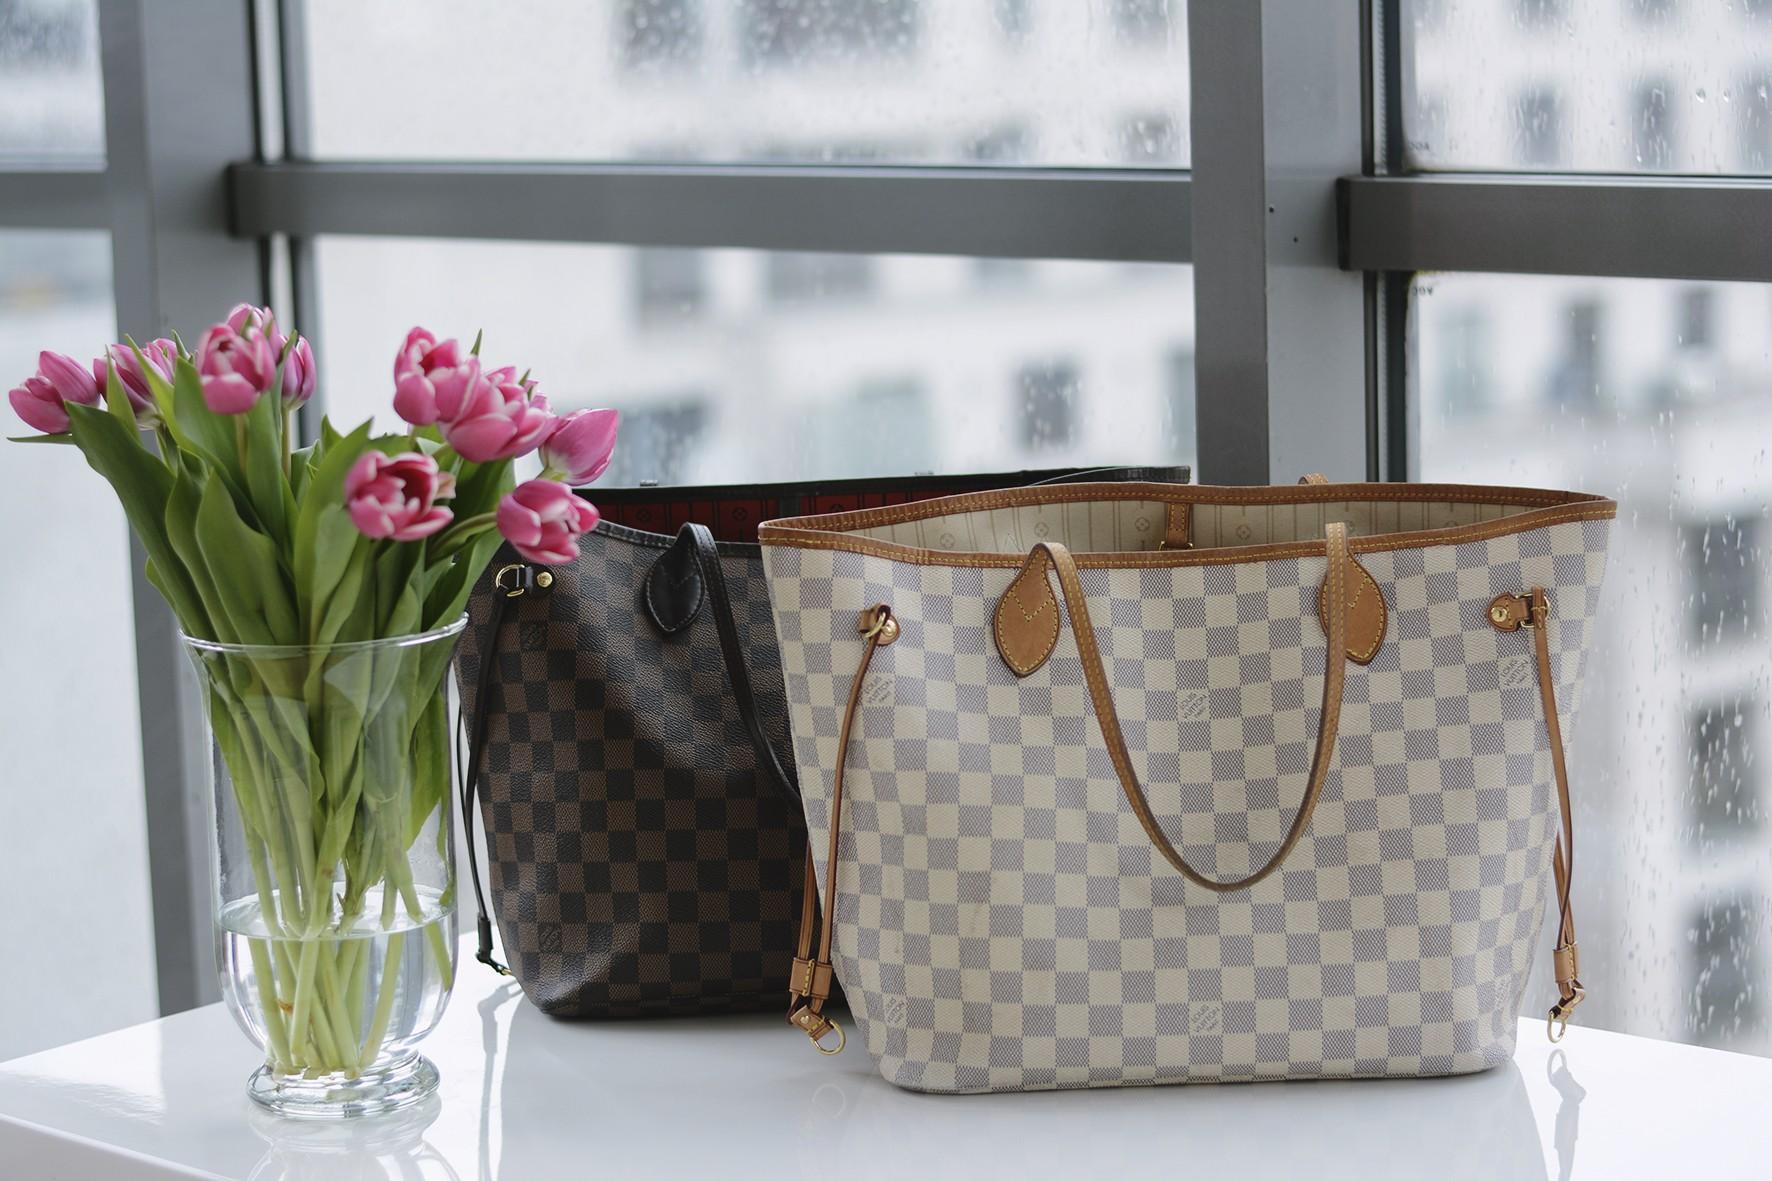 0ce6b83000f98 Louis Vuitton - który model warto kupić?